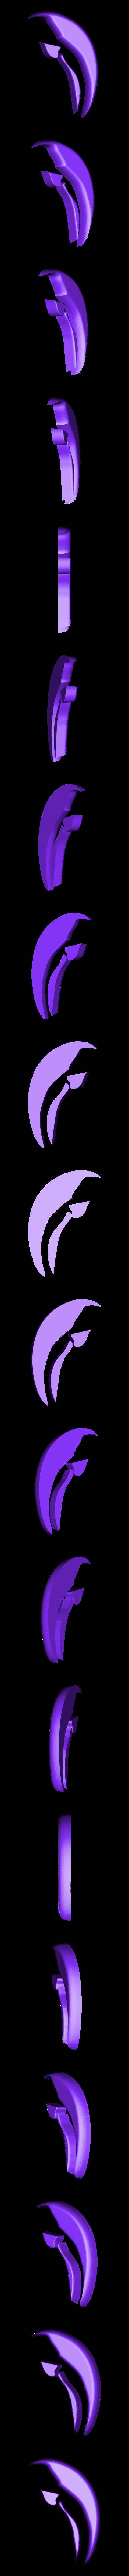 white.stl Download free STL file 2-Color Dolphin (Remix) Key Chain • 3D print template, lowboydrvr